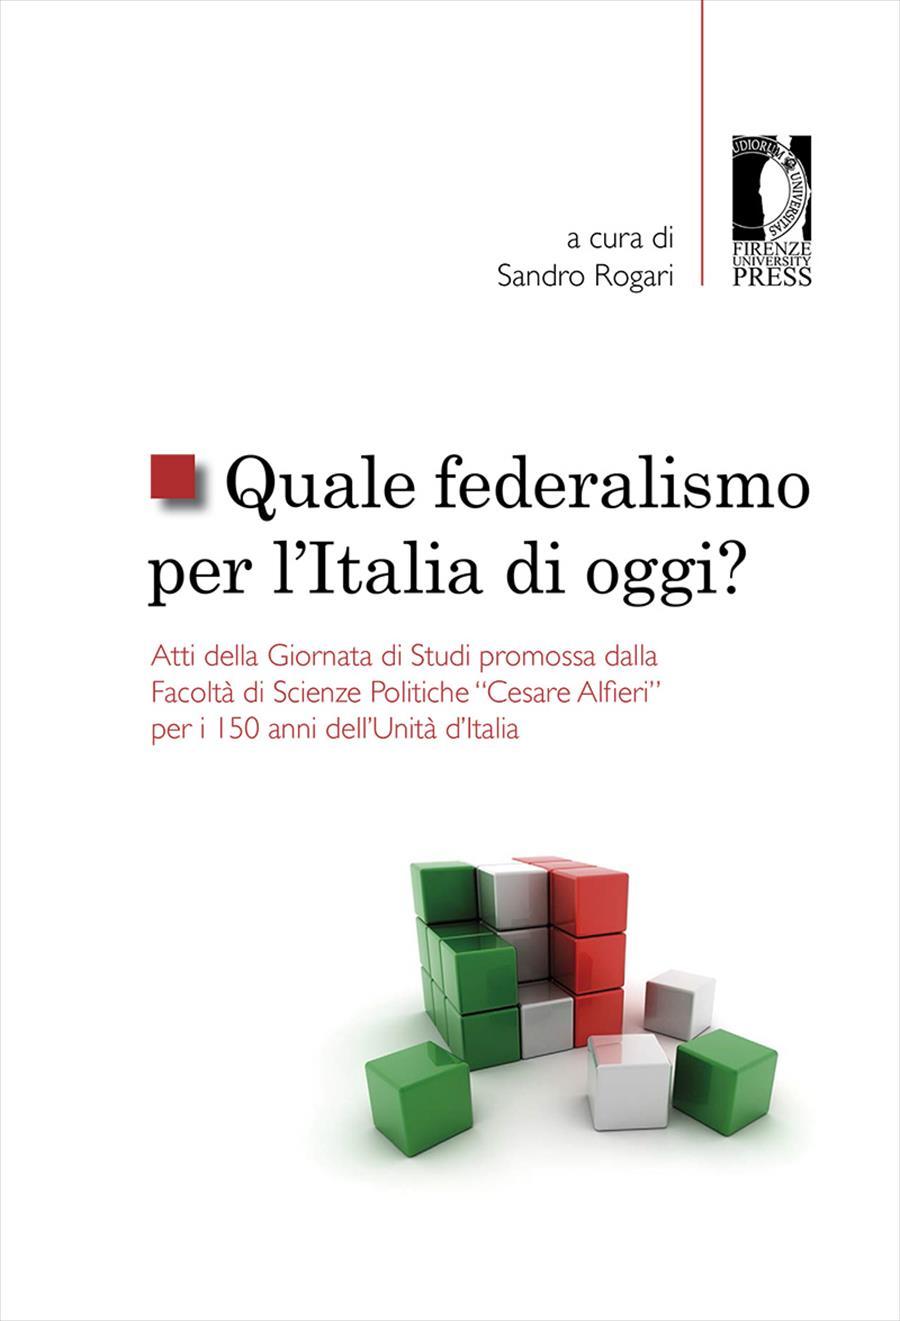 Quale federalismo per l'Italia di oggi?